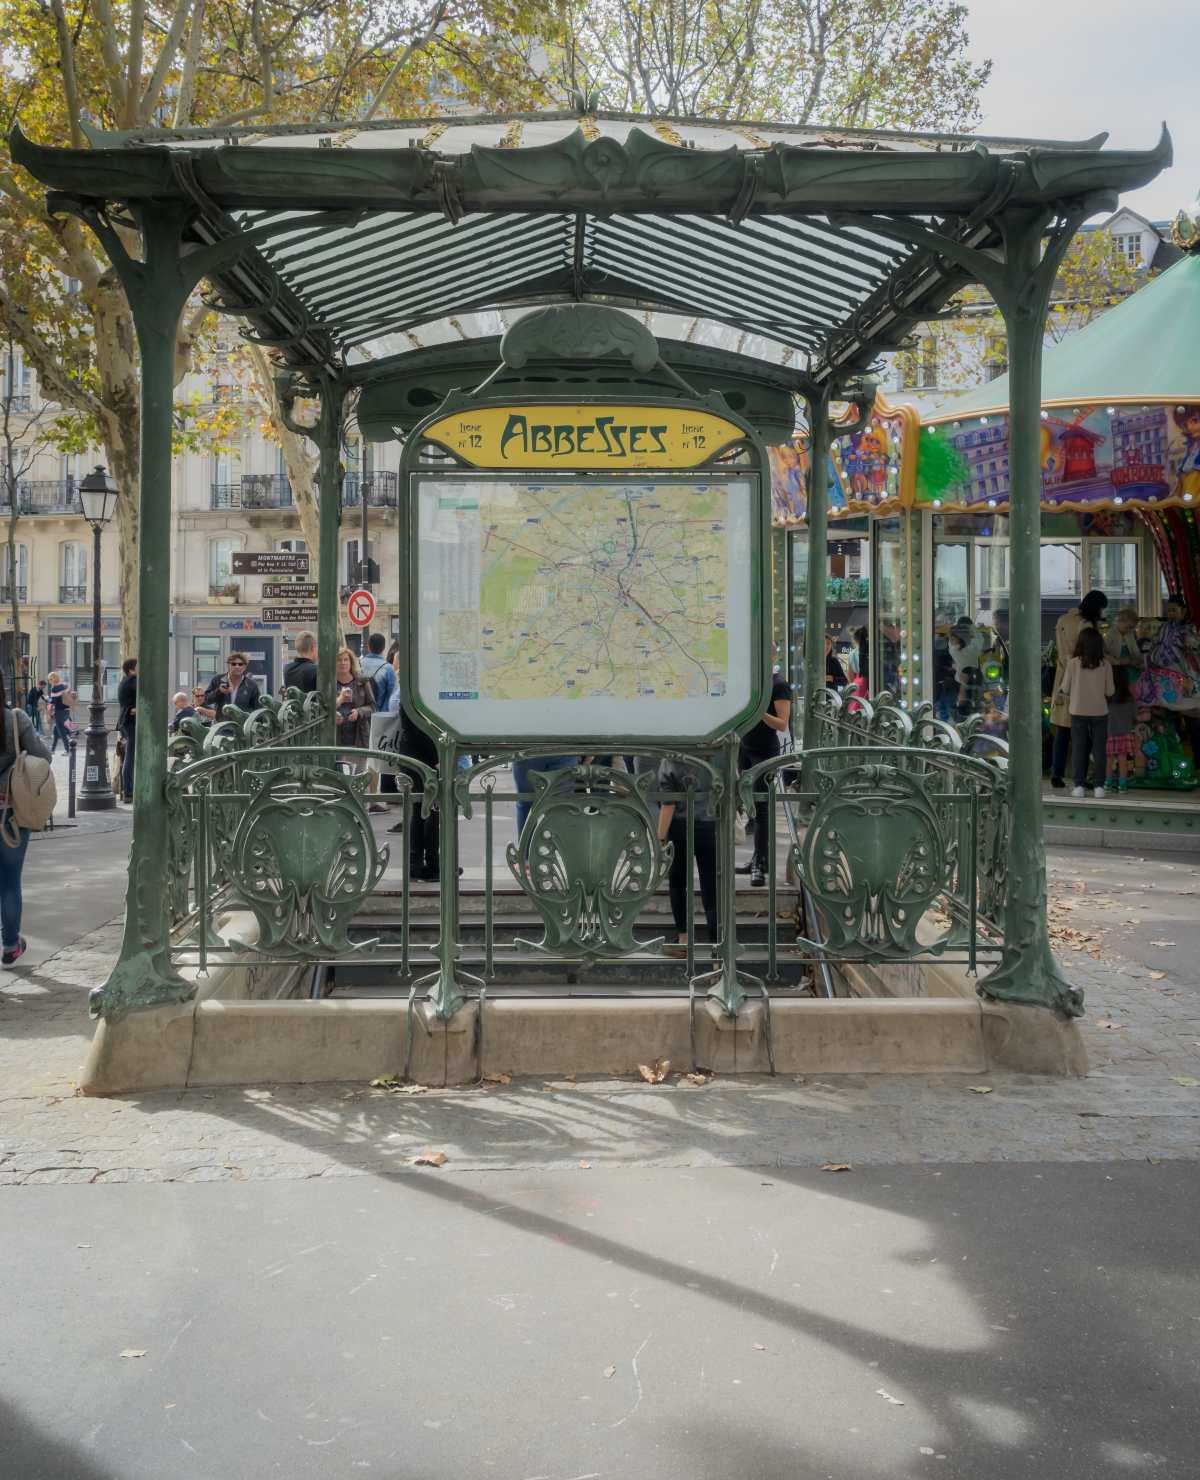 Les Abbesses, Μονμάρτη, Παρίσι